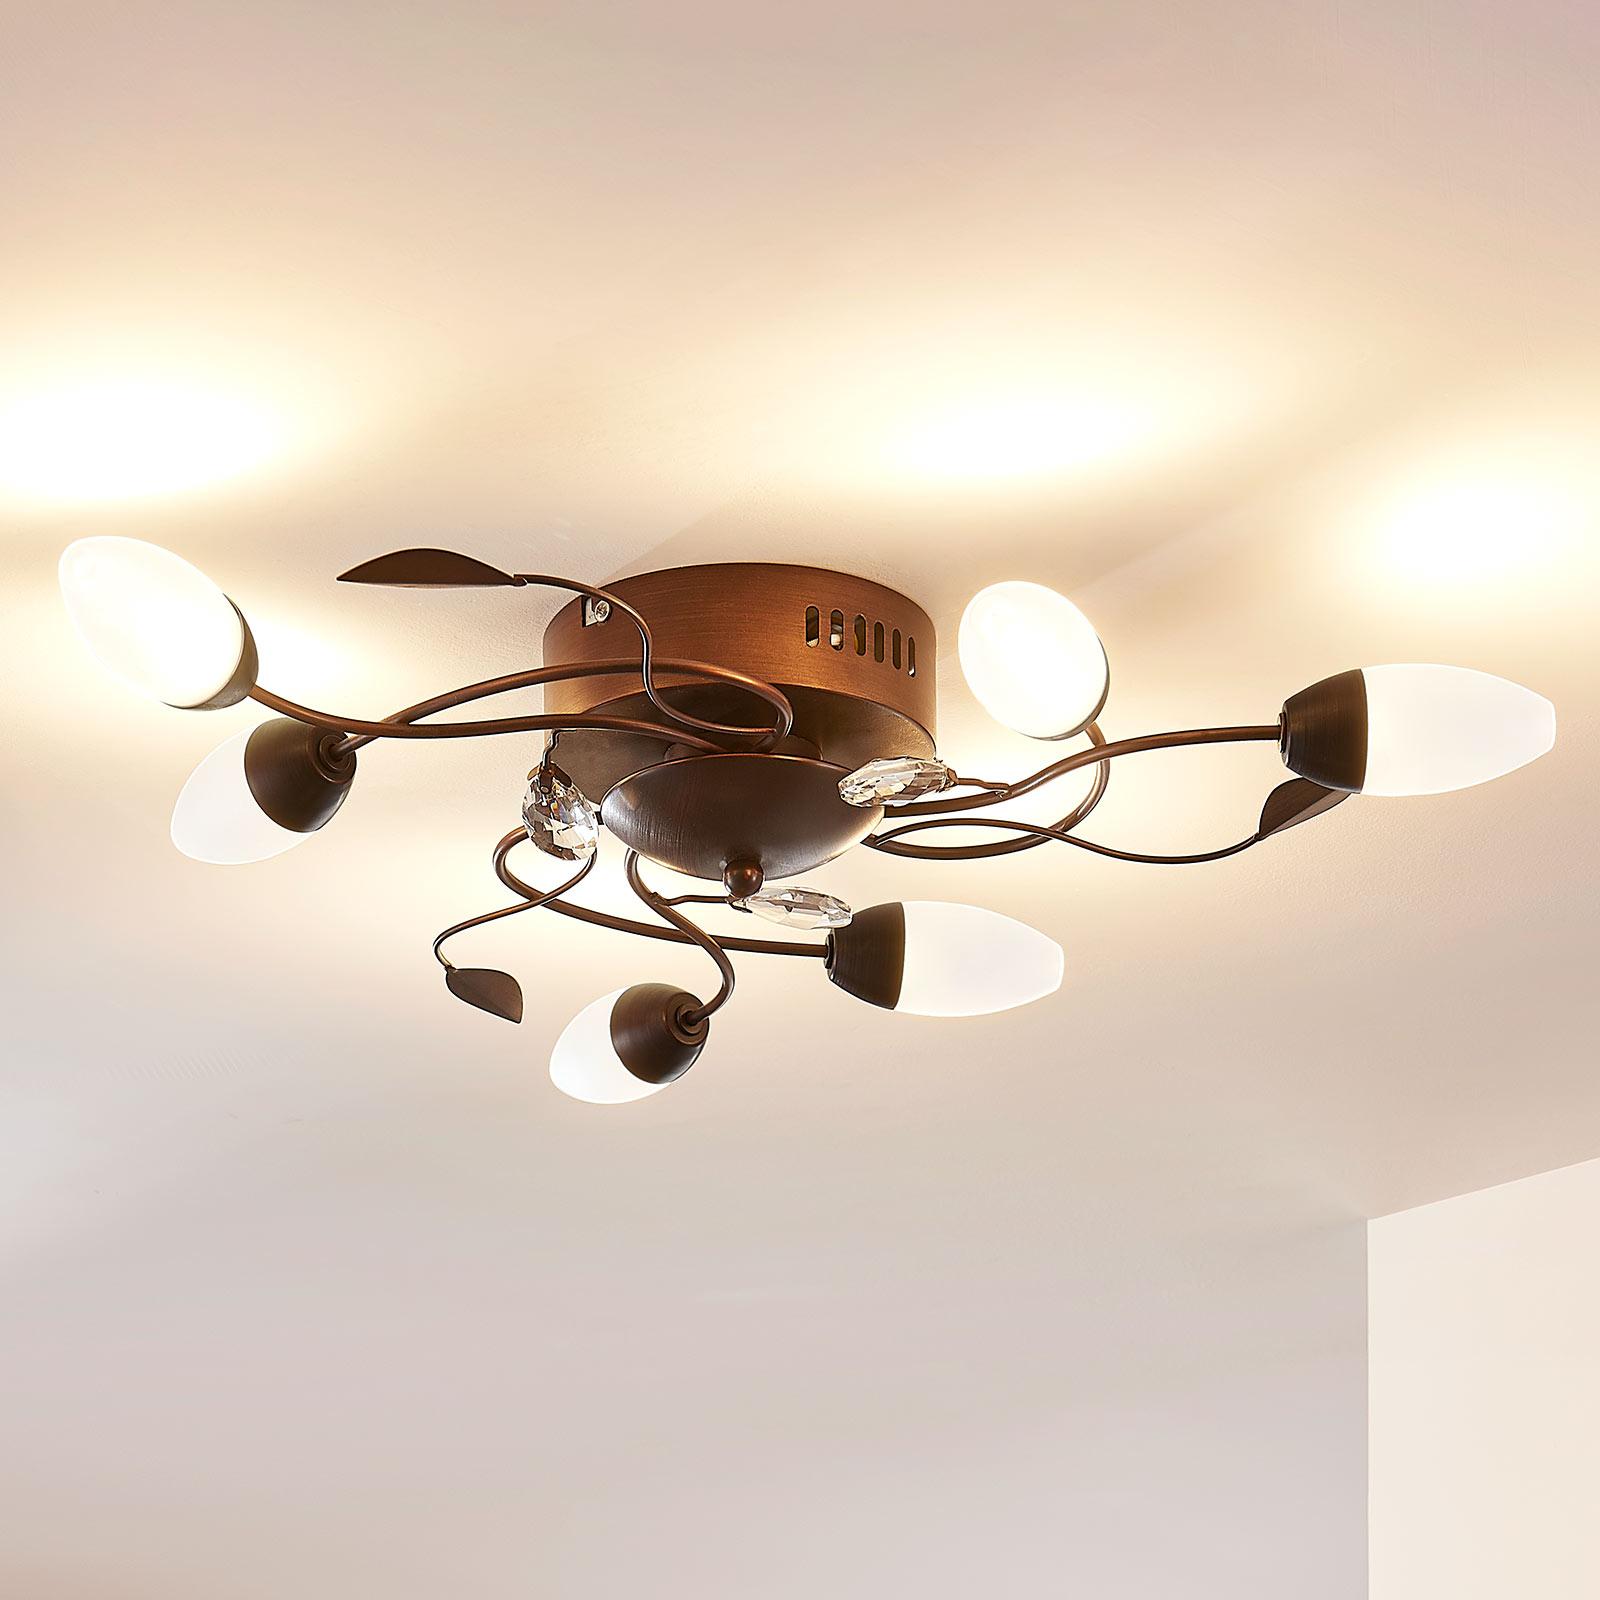 Dimbare LED plafondlamp Renato, 6 lampen, bruin